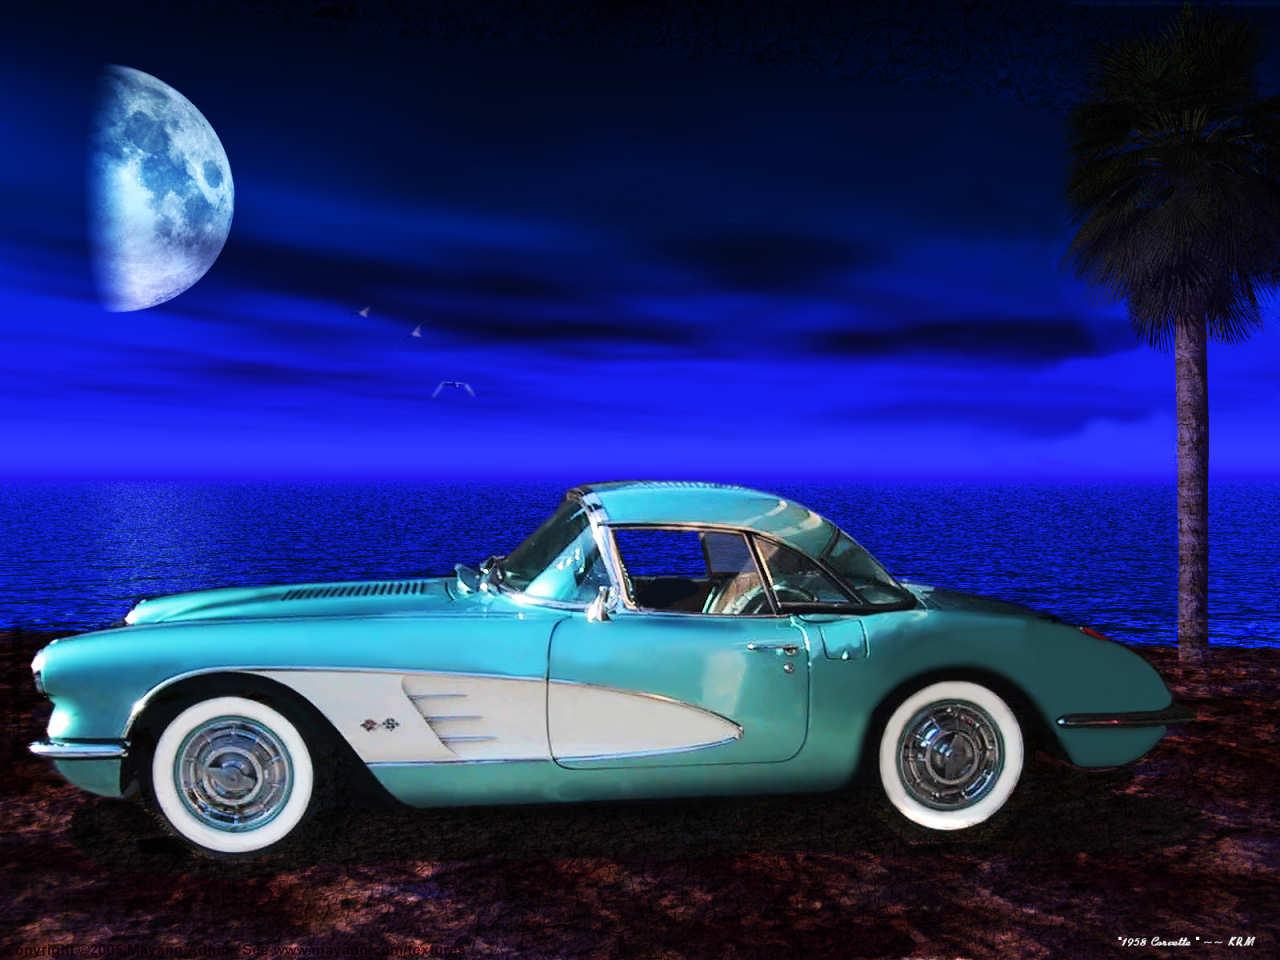 Click image for larger version  Name:AM_21 1958 Corvette=KRM.jpg Views:228 Size:113.5 KB ID:21532